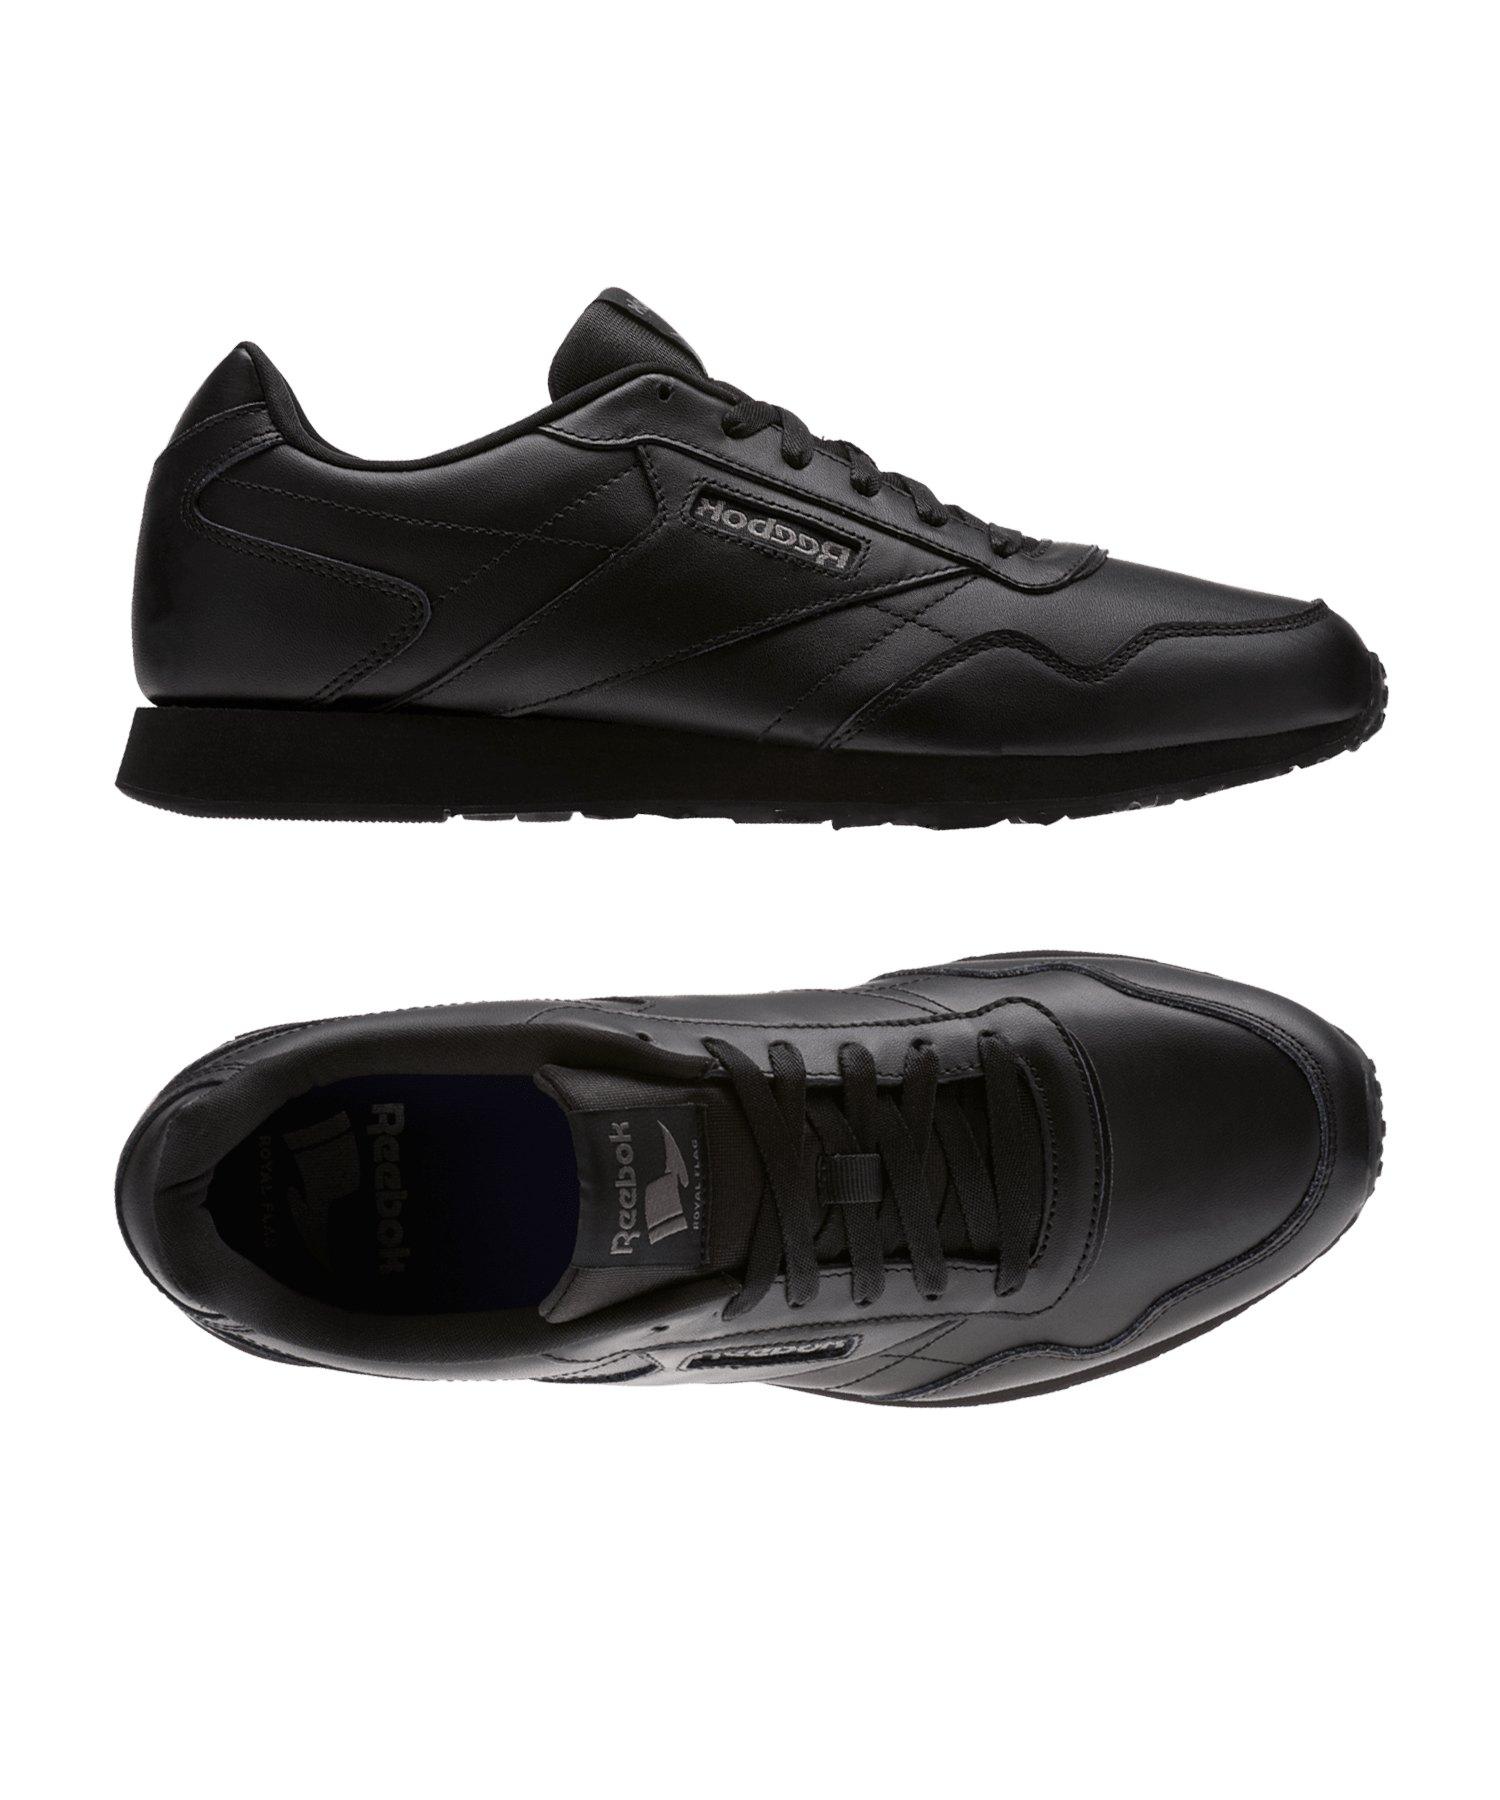 Reebok Royal Glide LX Sneaker Schwarz - schwarz